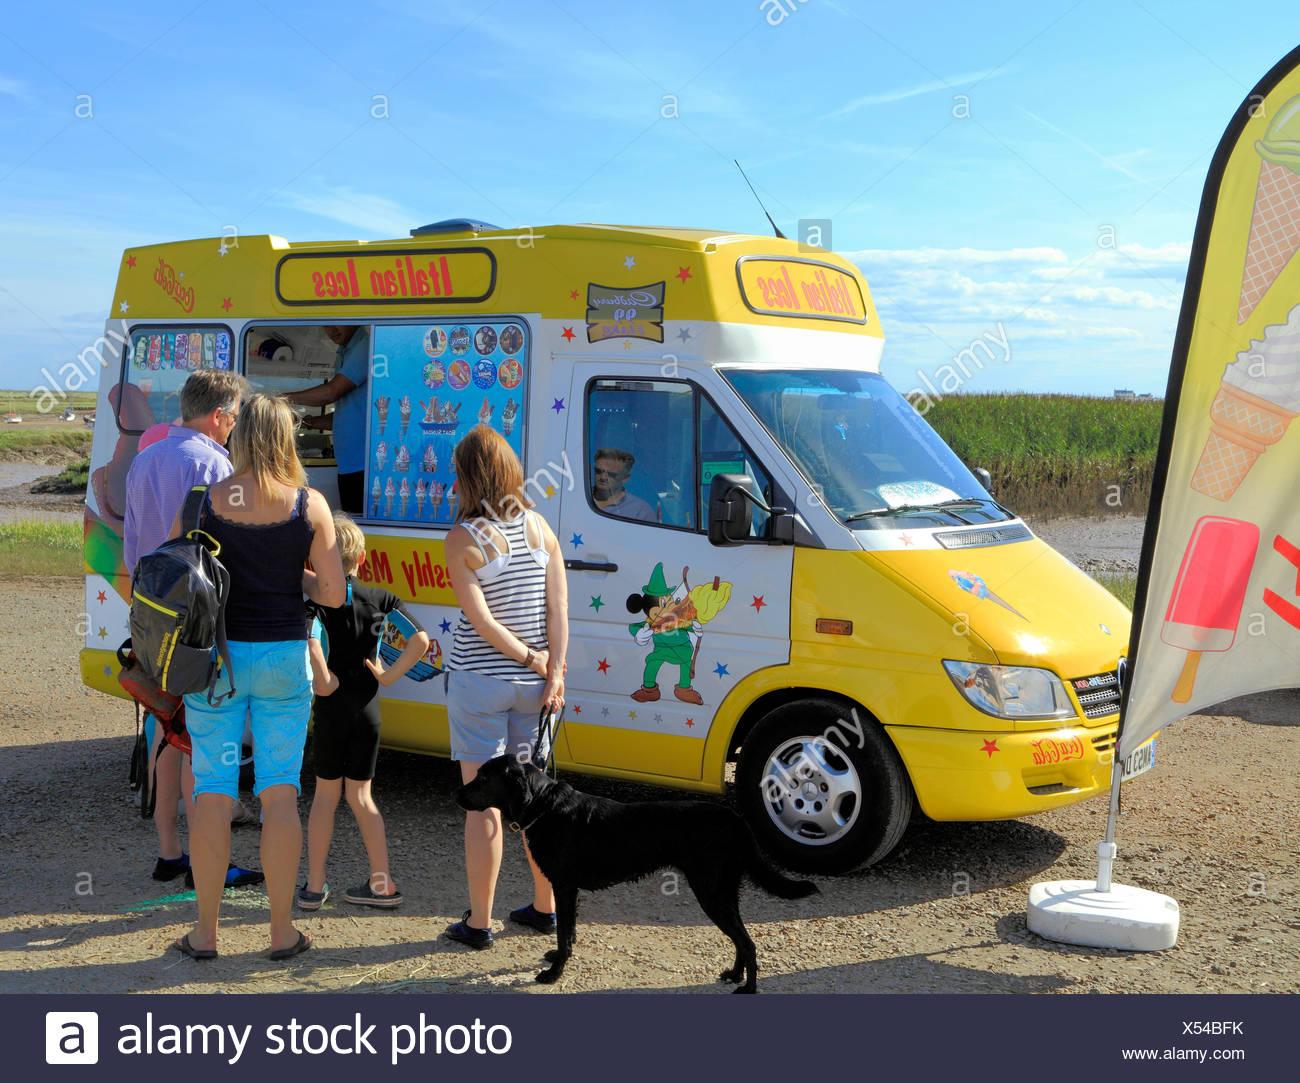 Italian Ice Cream Van, Ices, Brancaster Staithe, people, customers, Ice Creams, sales, Norfolk, England, UK - Stock Image